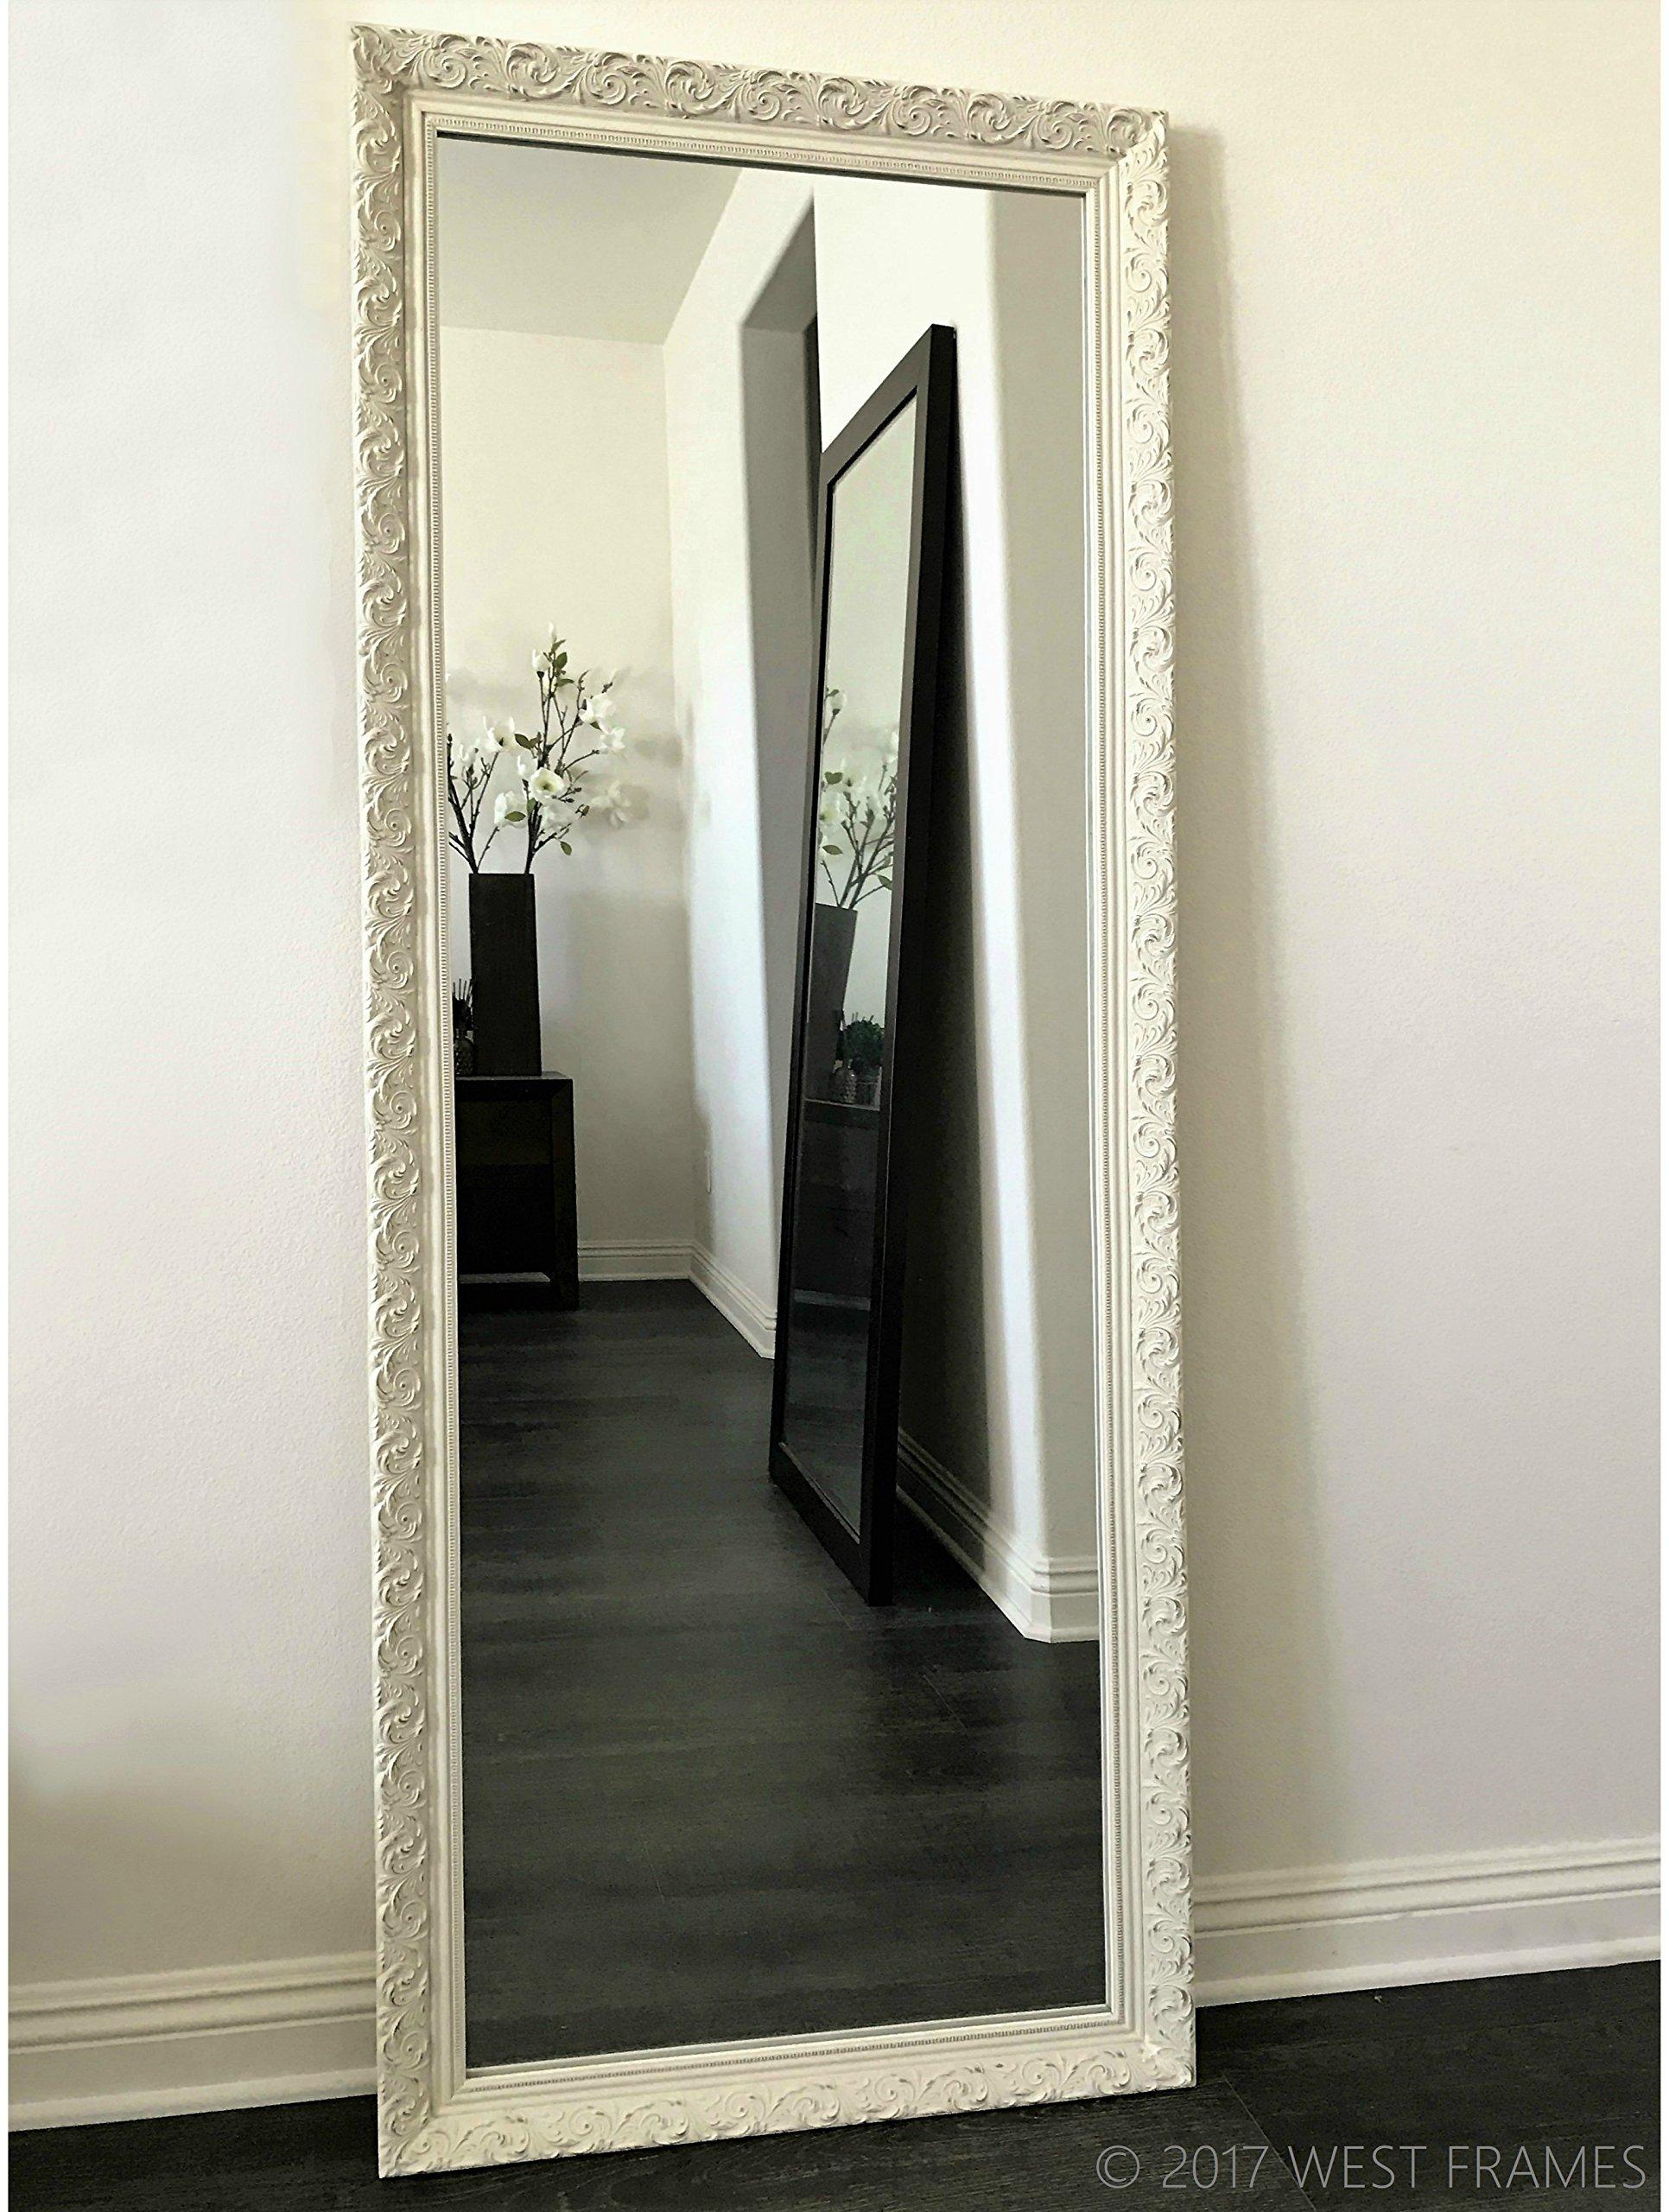 West Frames Bella Ornate Embossed Antique White Wood Framed Leaner Floor Mirror